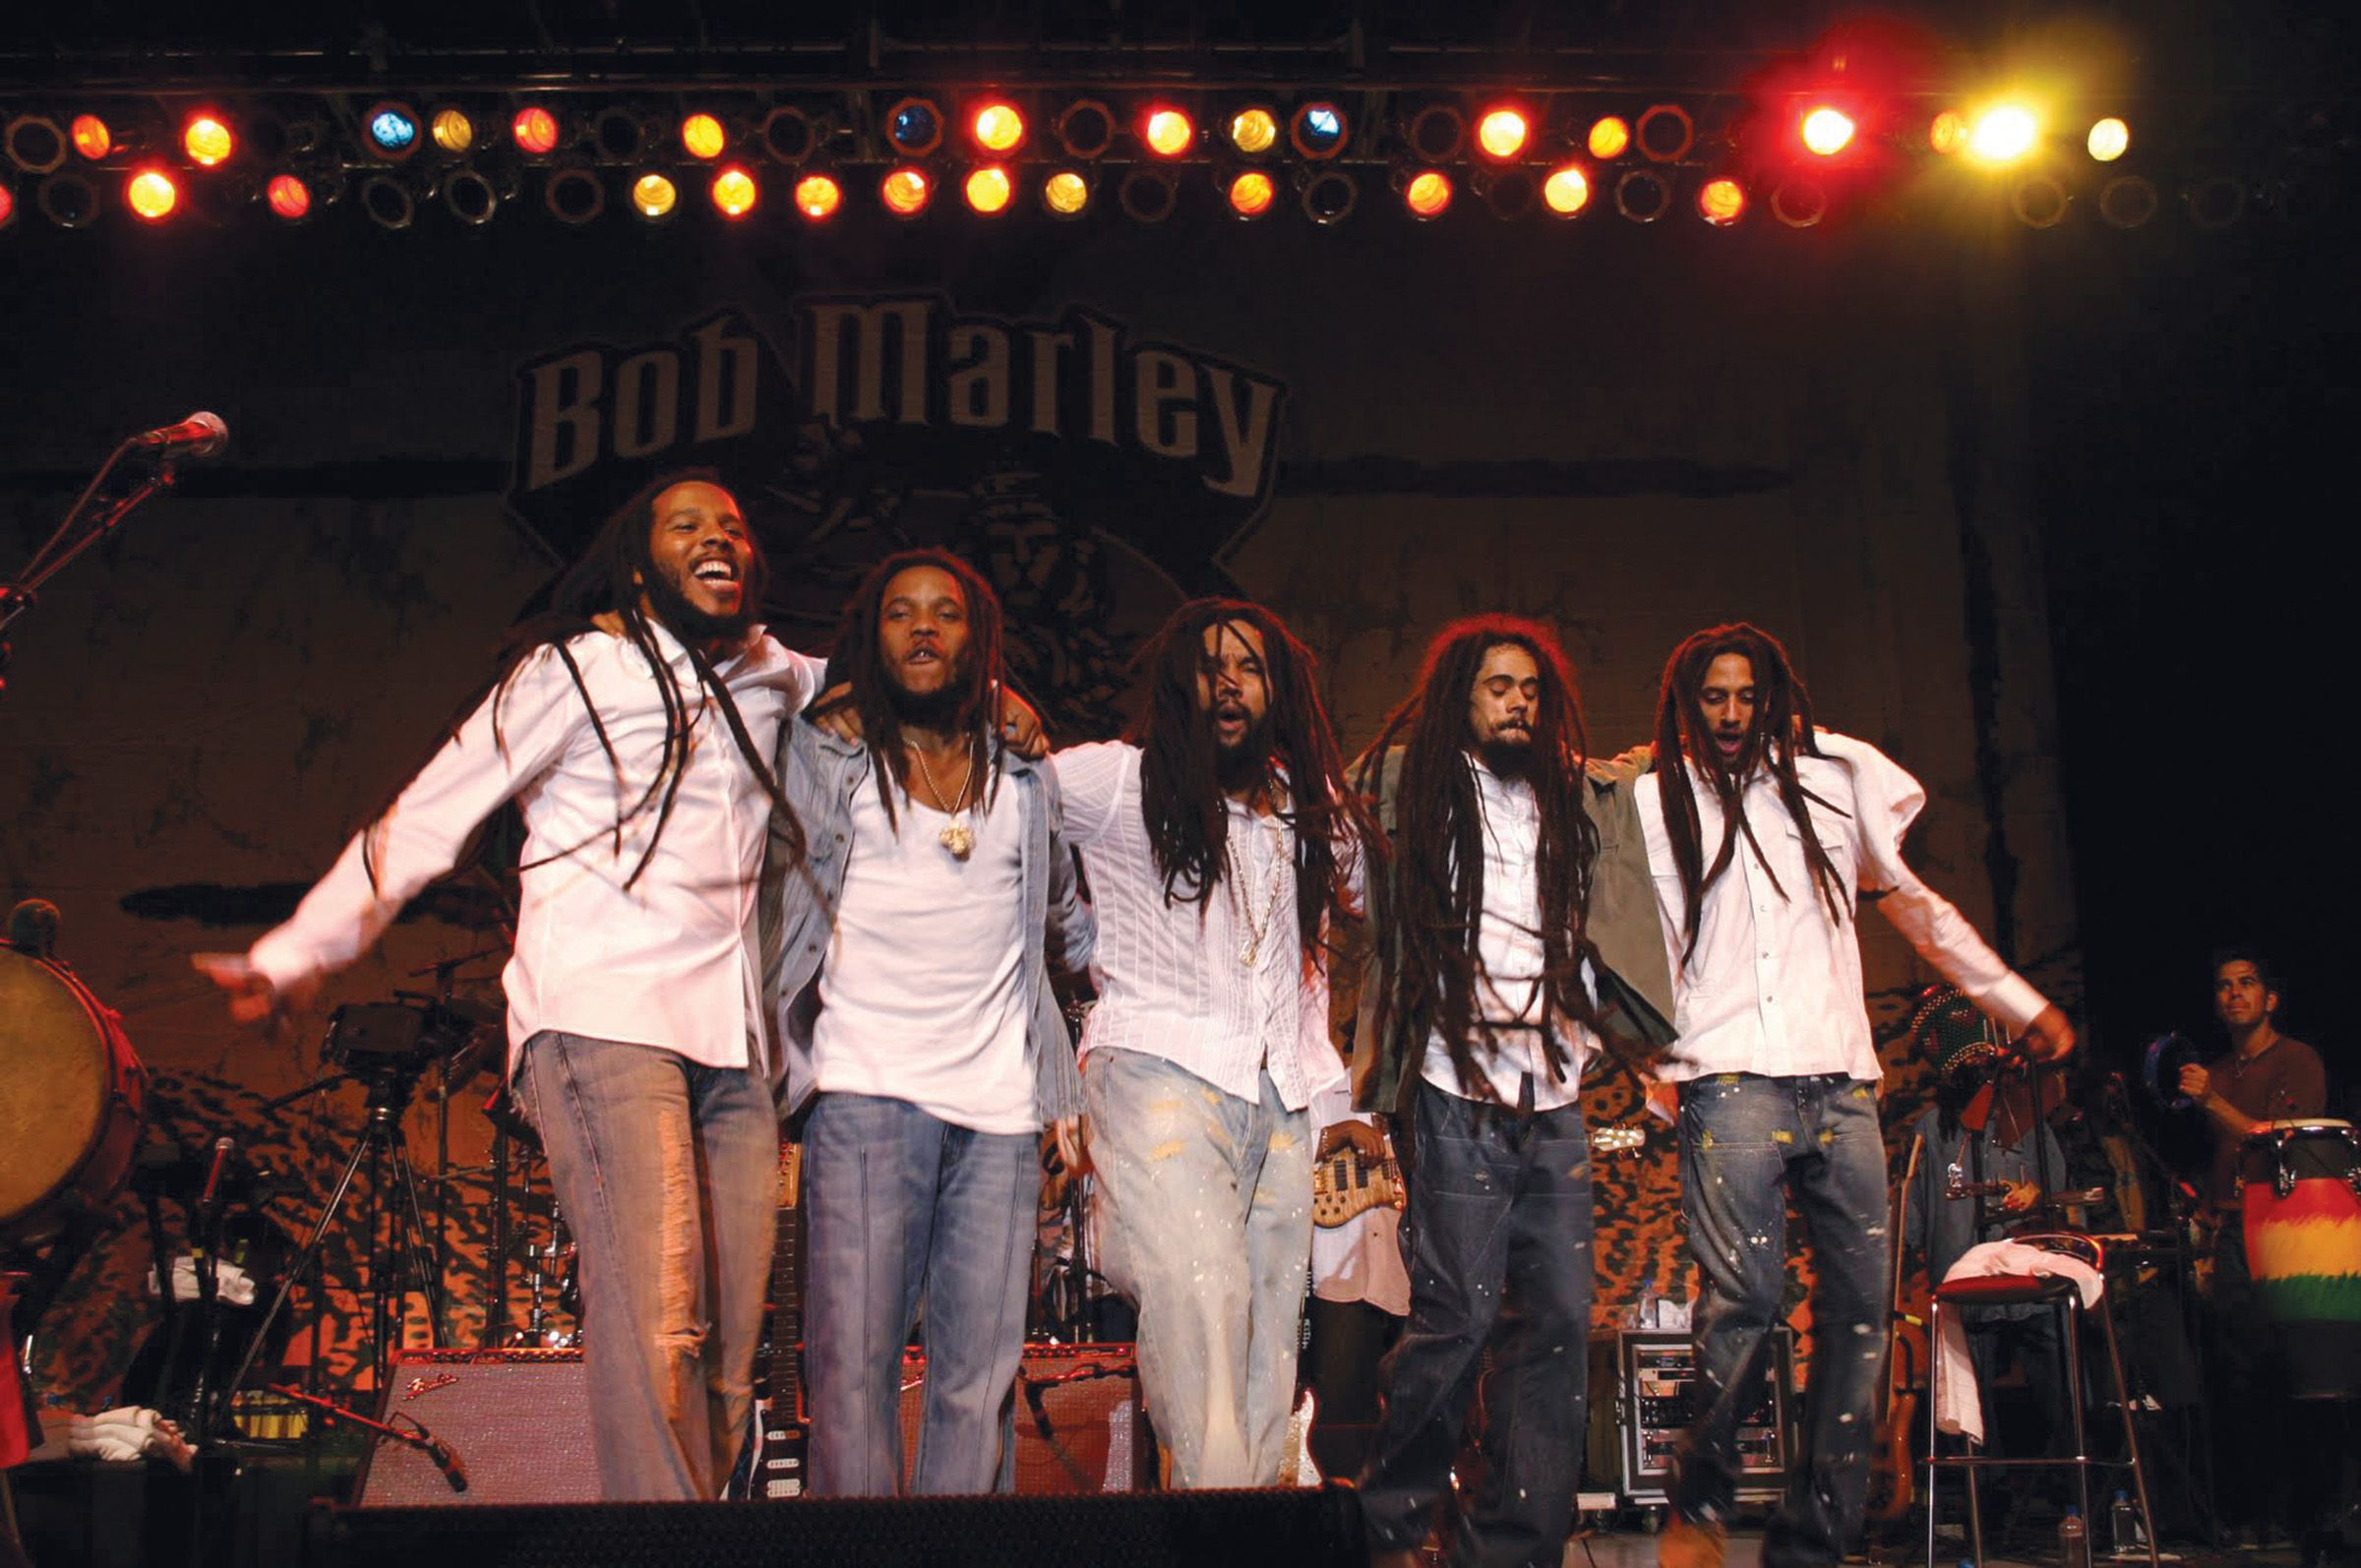 Kymani Marley Kids